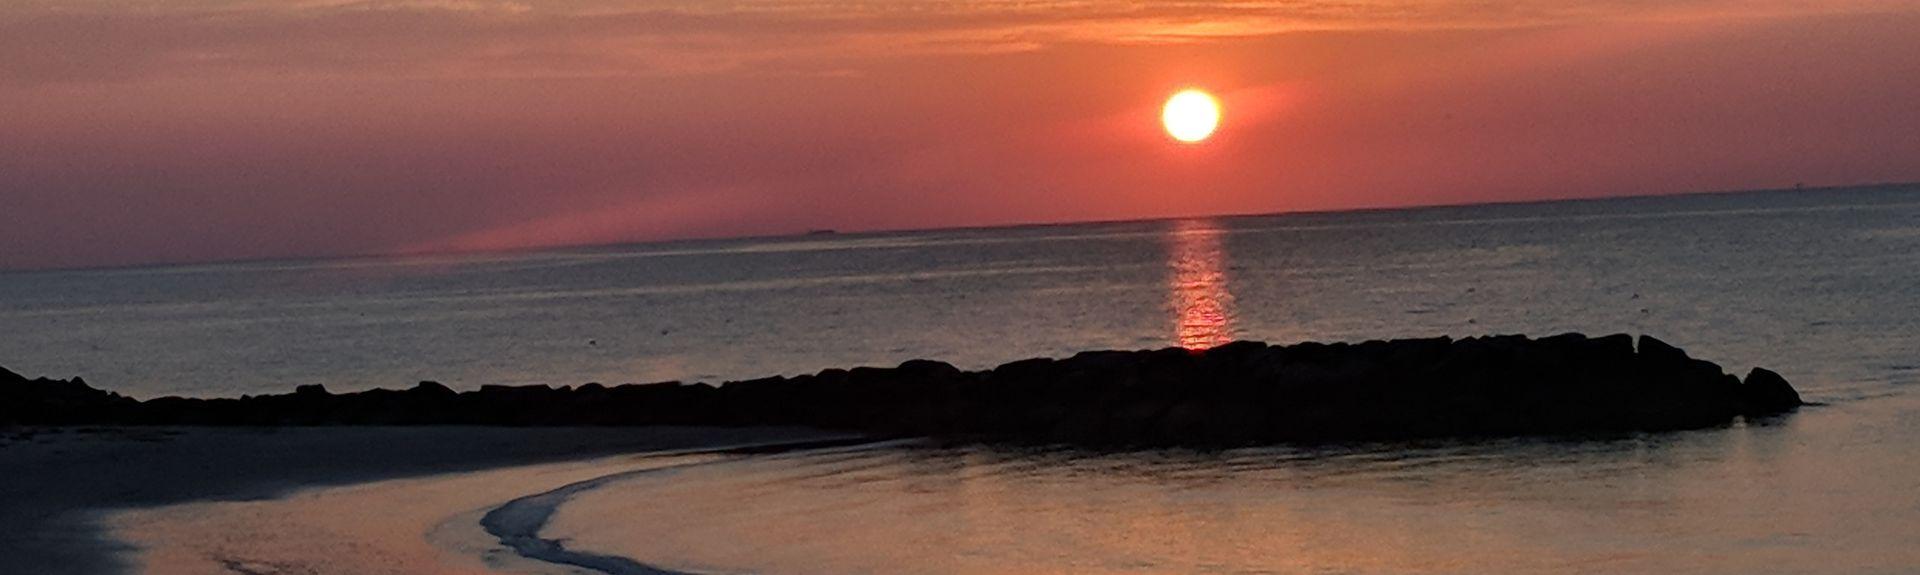 Buckroe Beach, Hampton, Virginia, USA